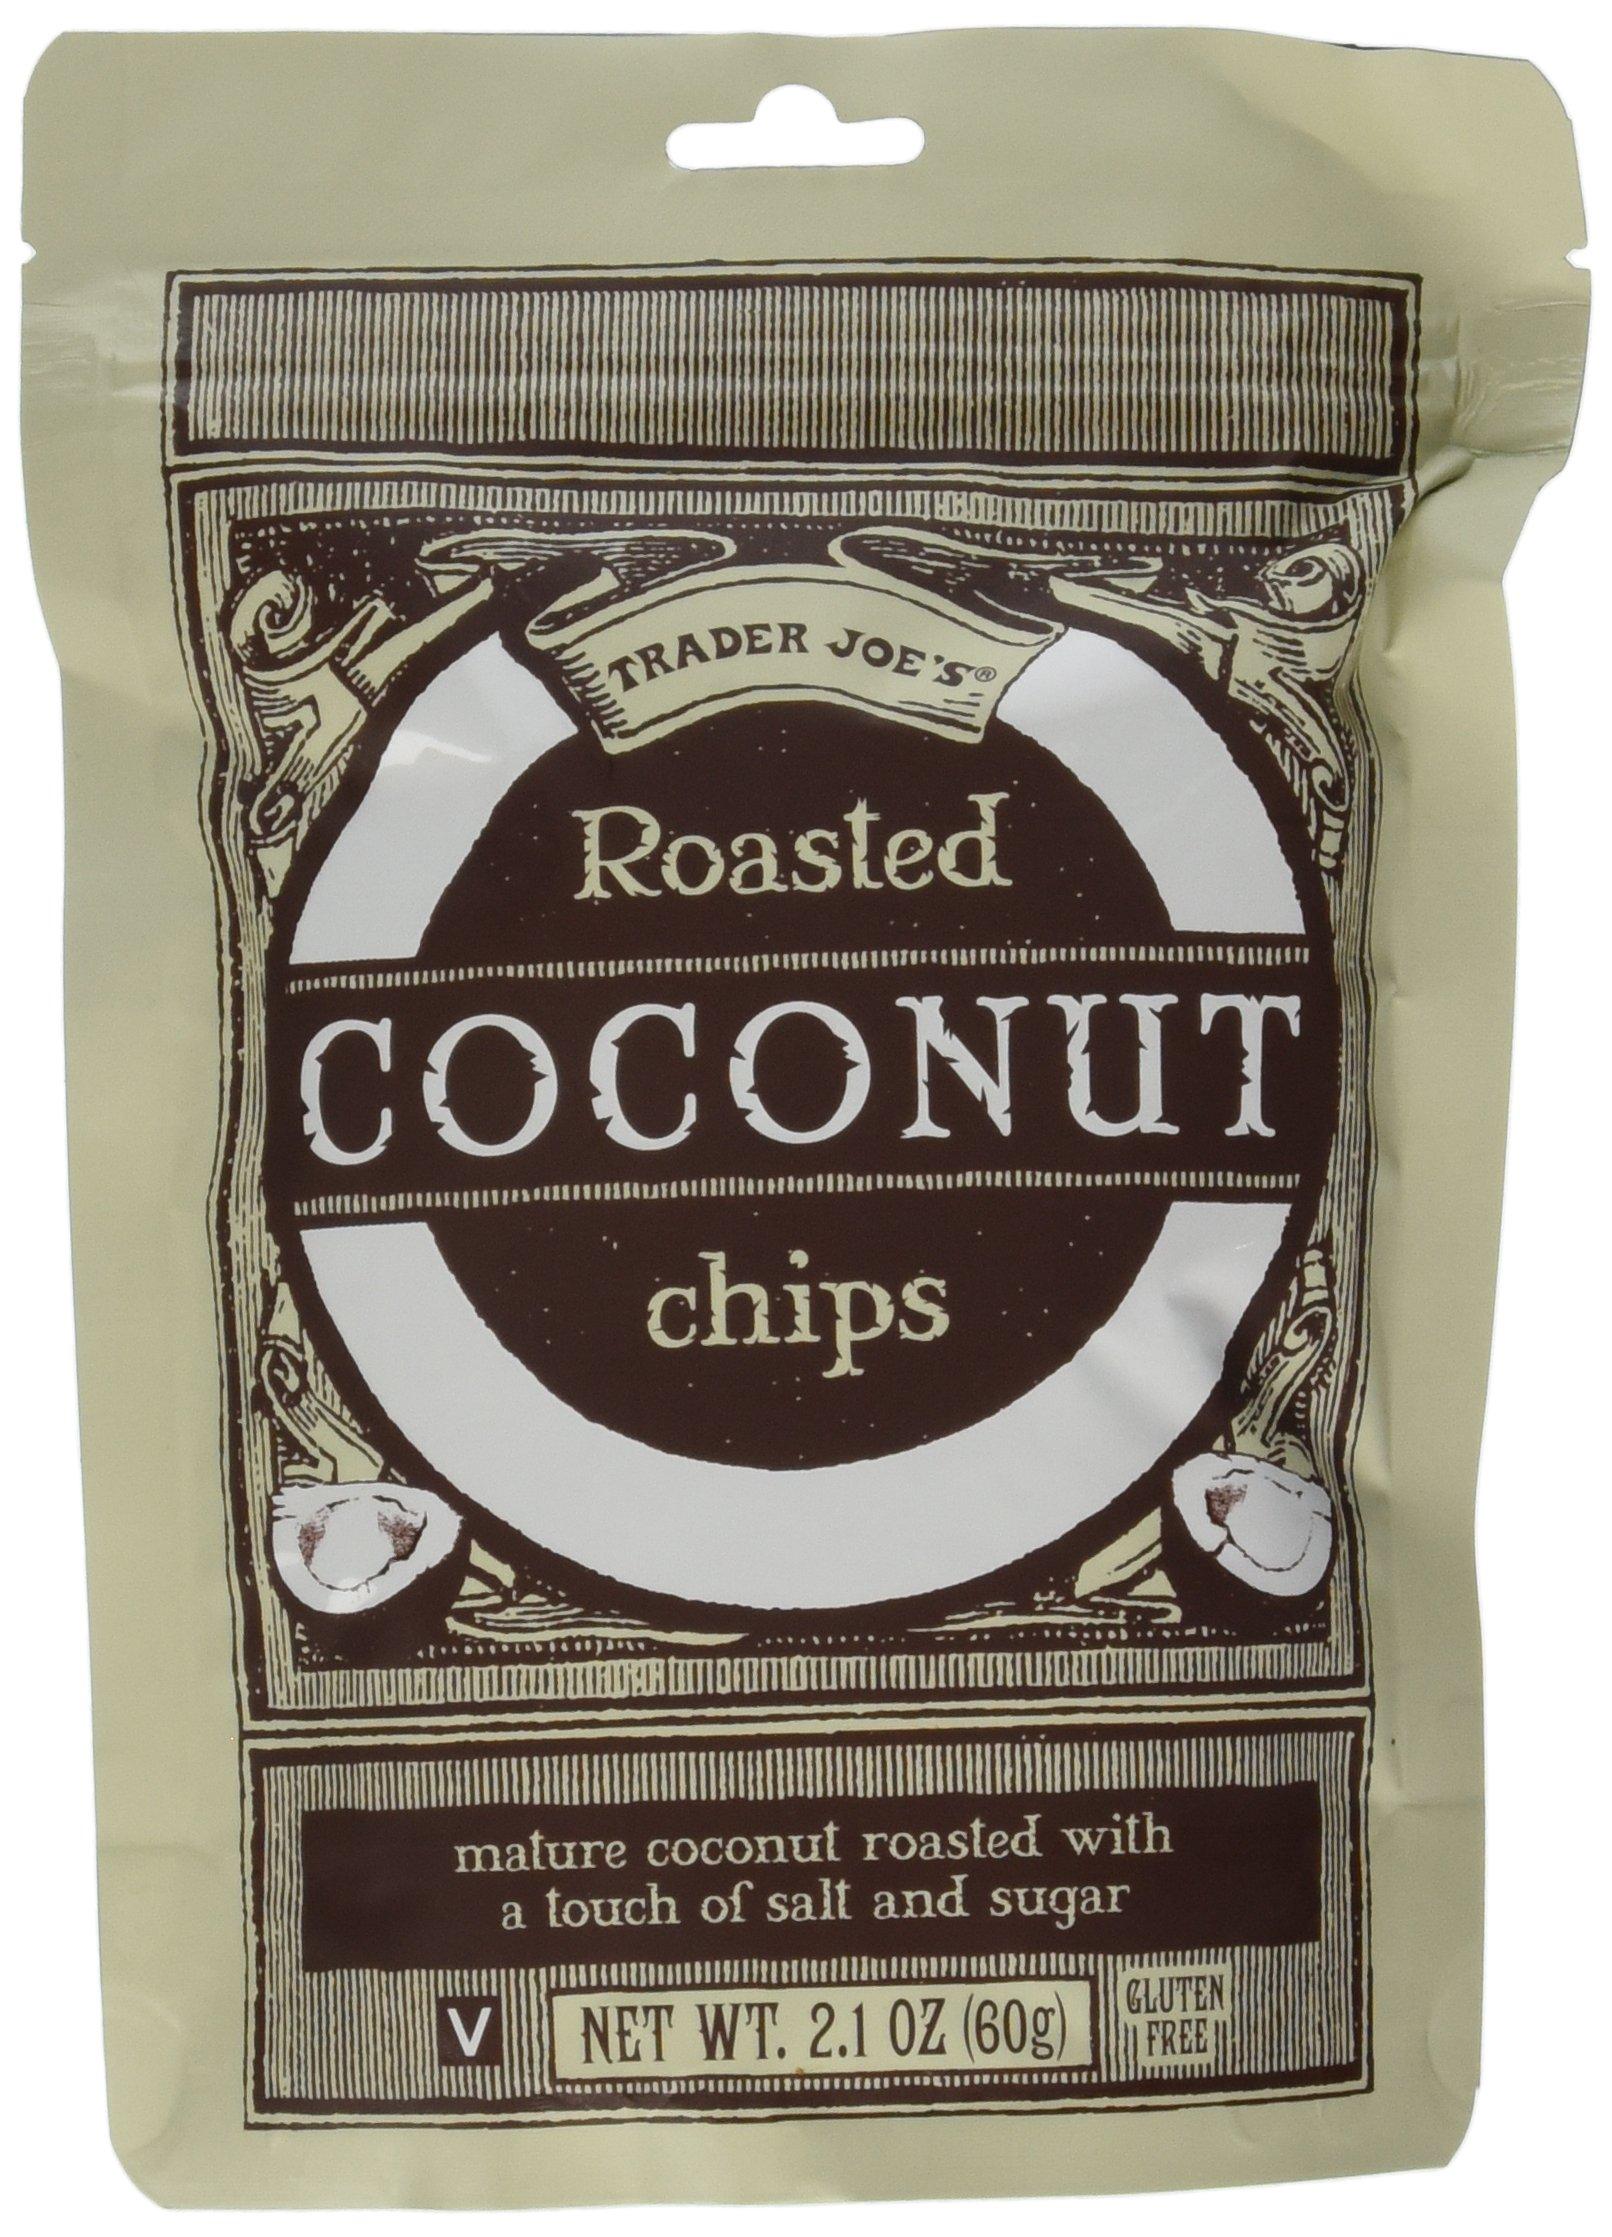 Trader Joe's Roasted Coconut Chips (4 Pack) by Trader Joe's